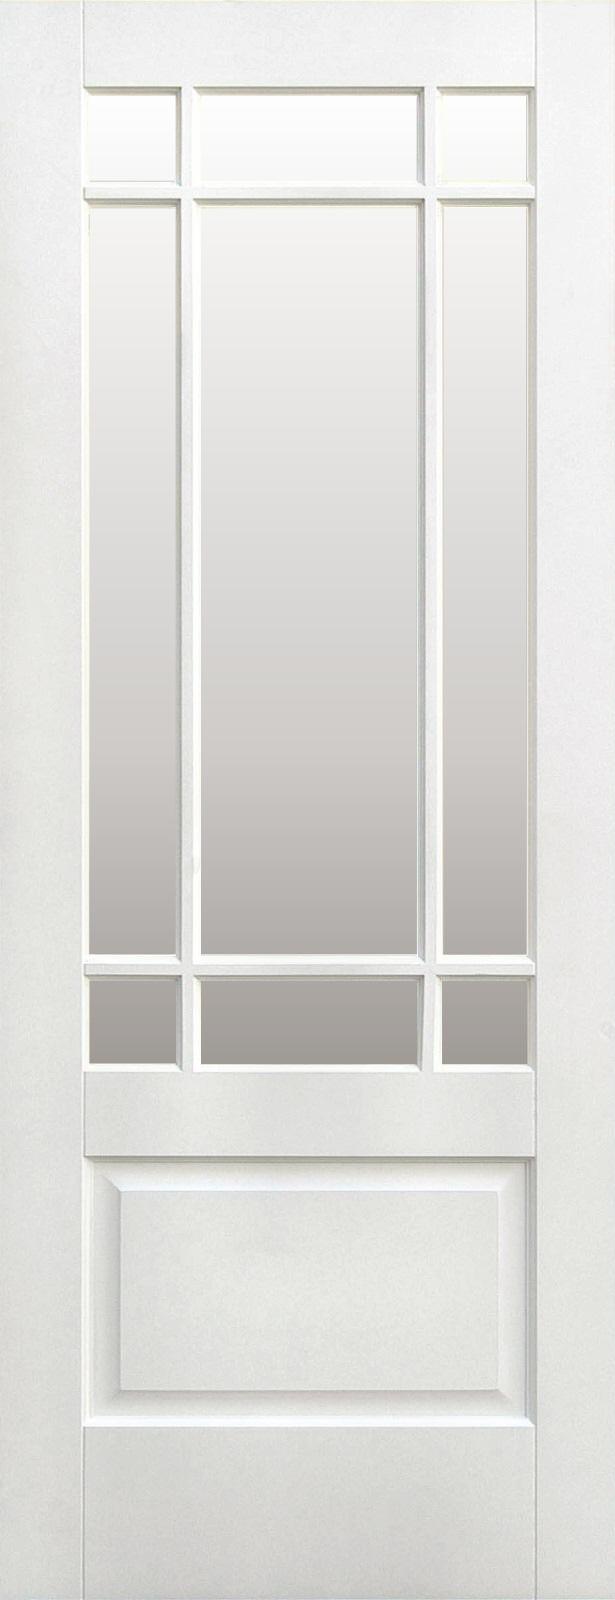 Diy store builders merchant worktops doors bedrooms furniture downham doors clear bevelled glass white primedg rubansaba